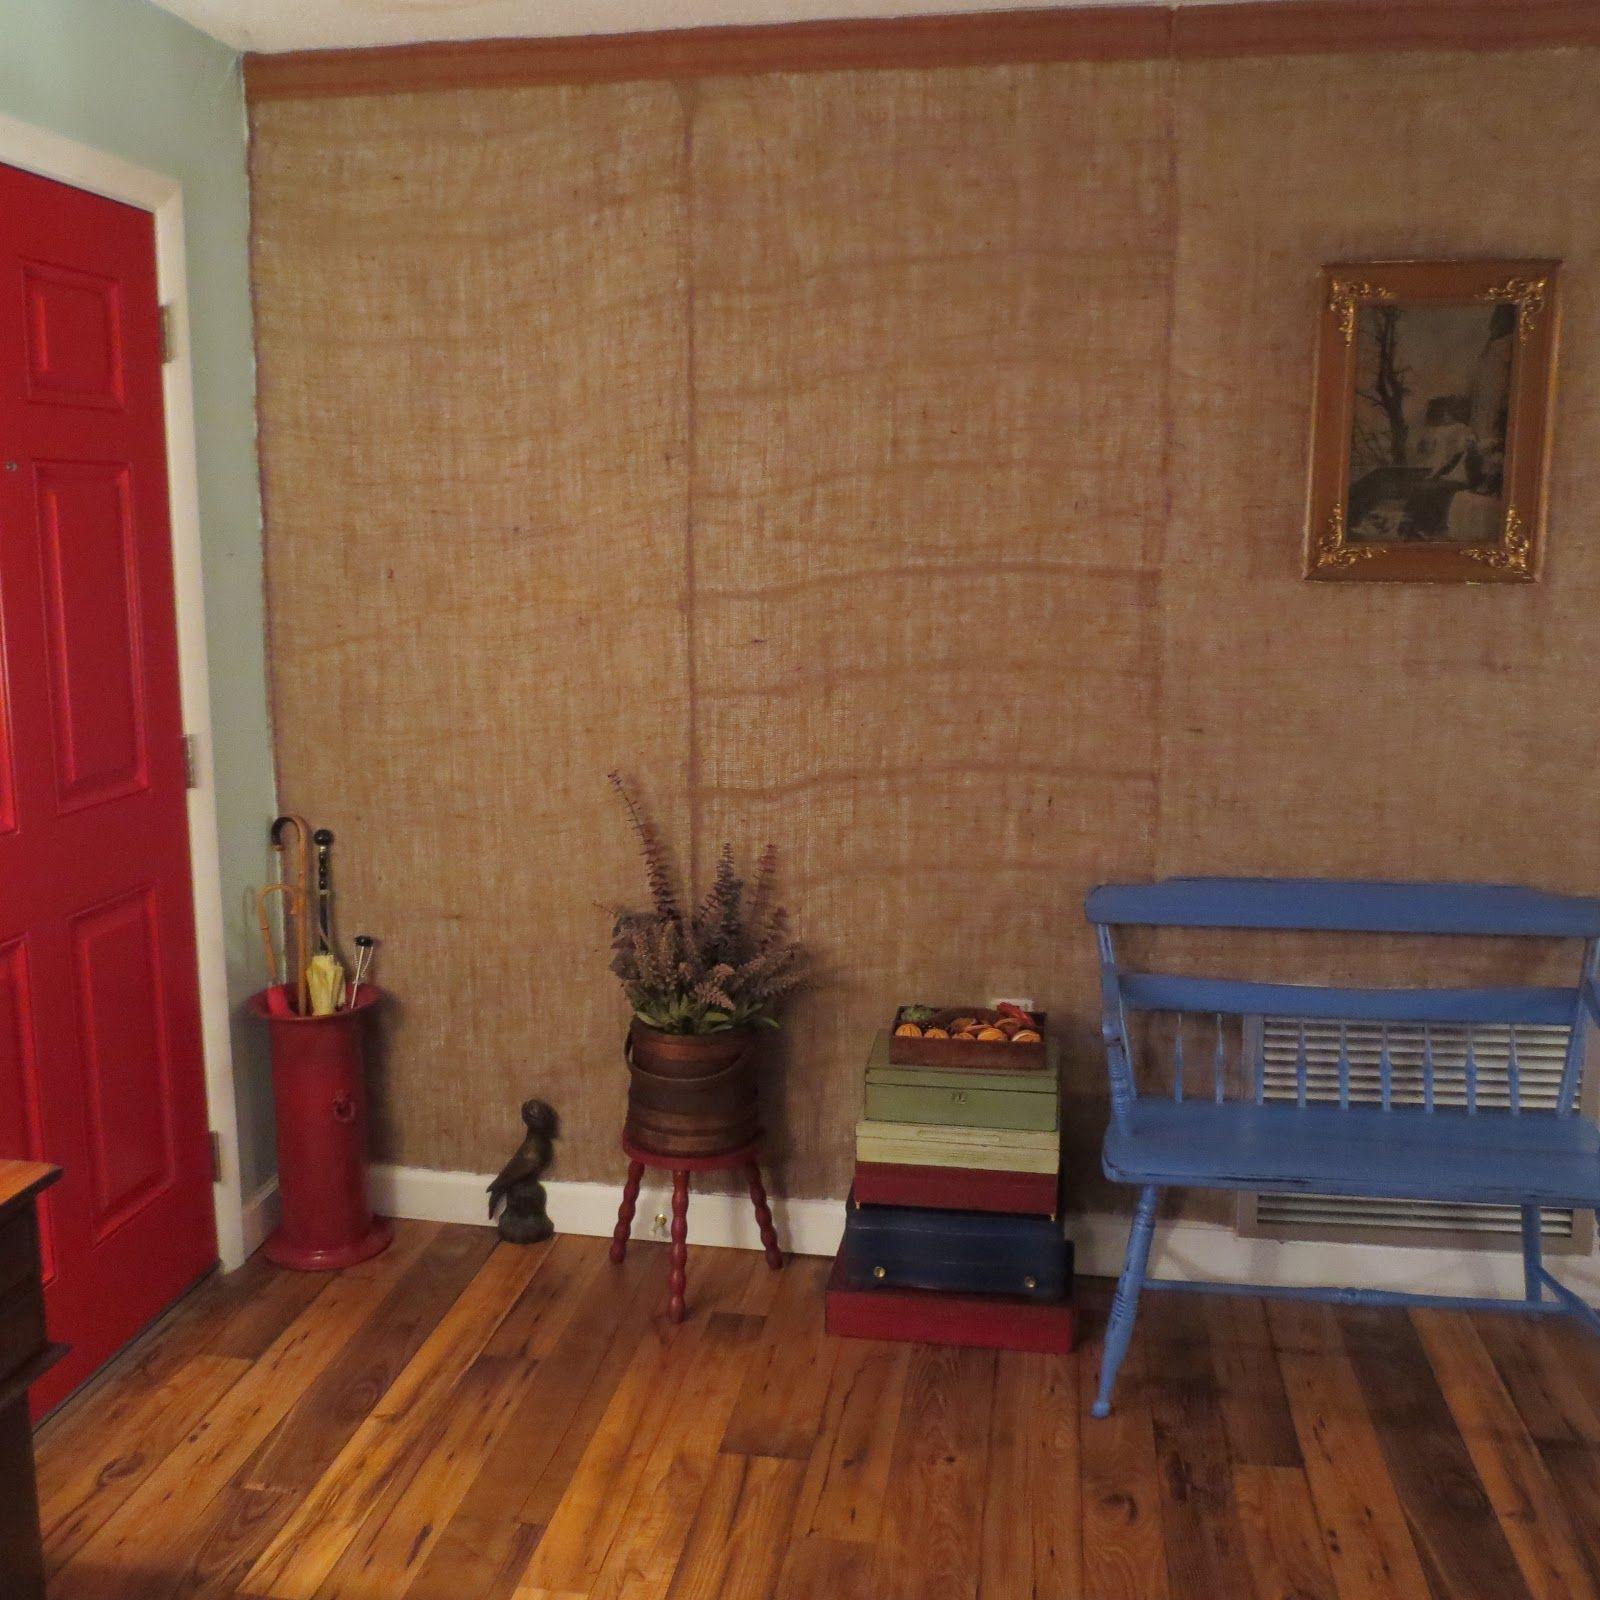 Temporary Wallpaper 5037 Res 1600x1600 Wallr